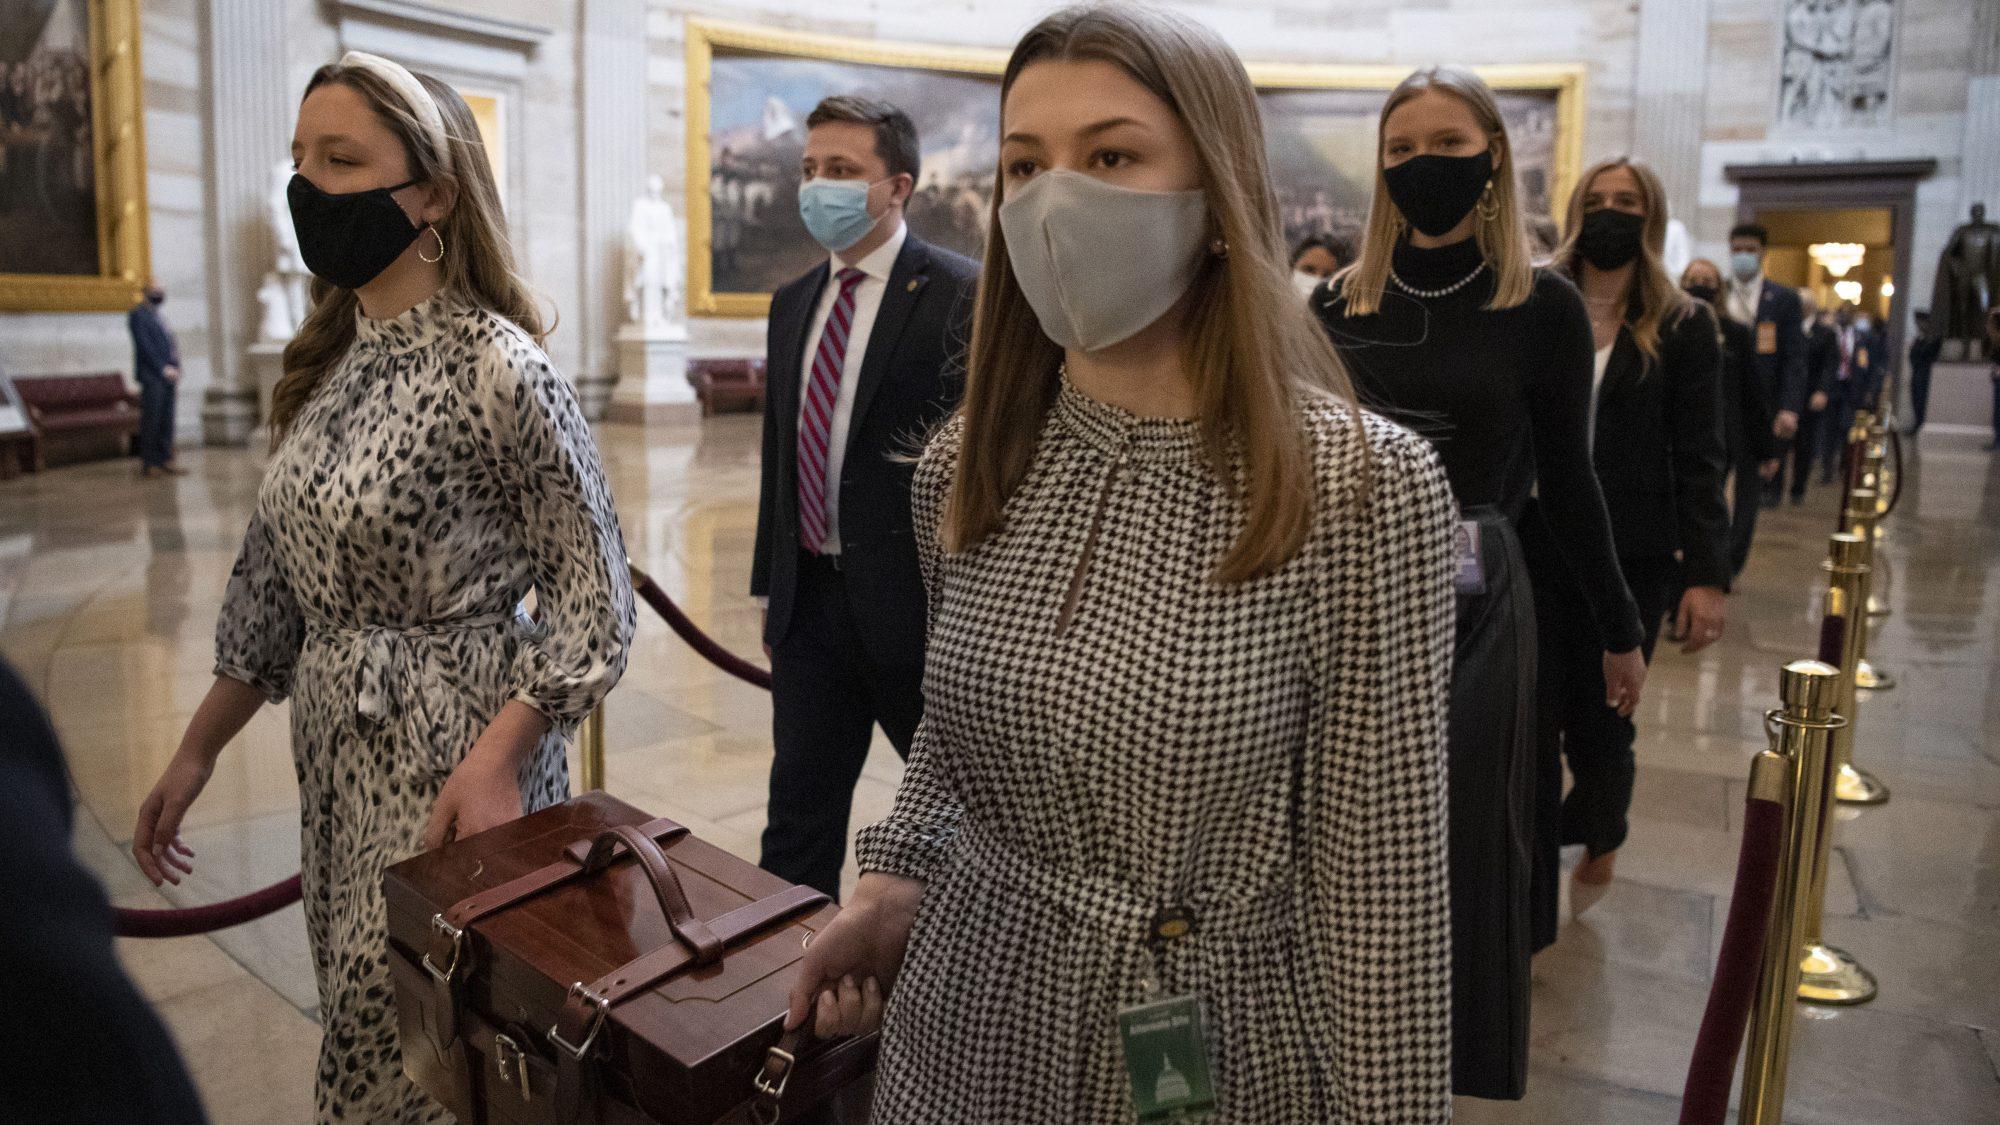 Senate aides carrying ballot boxes